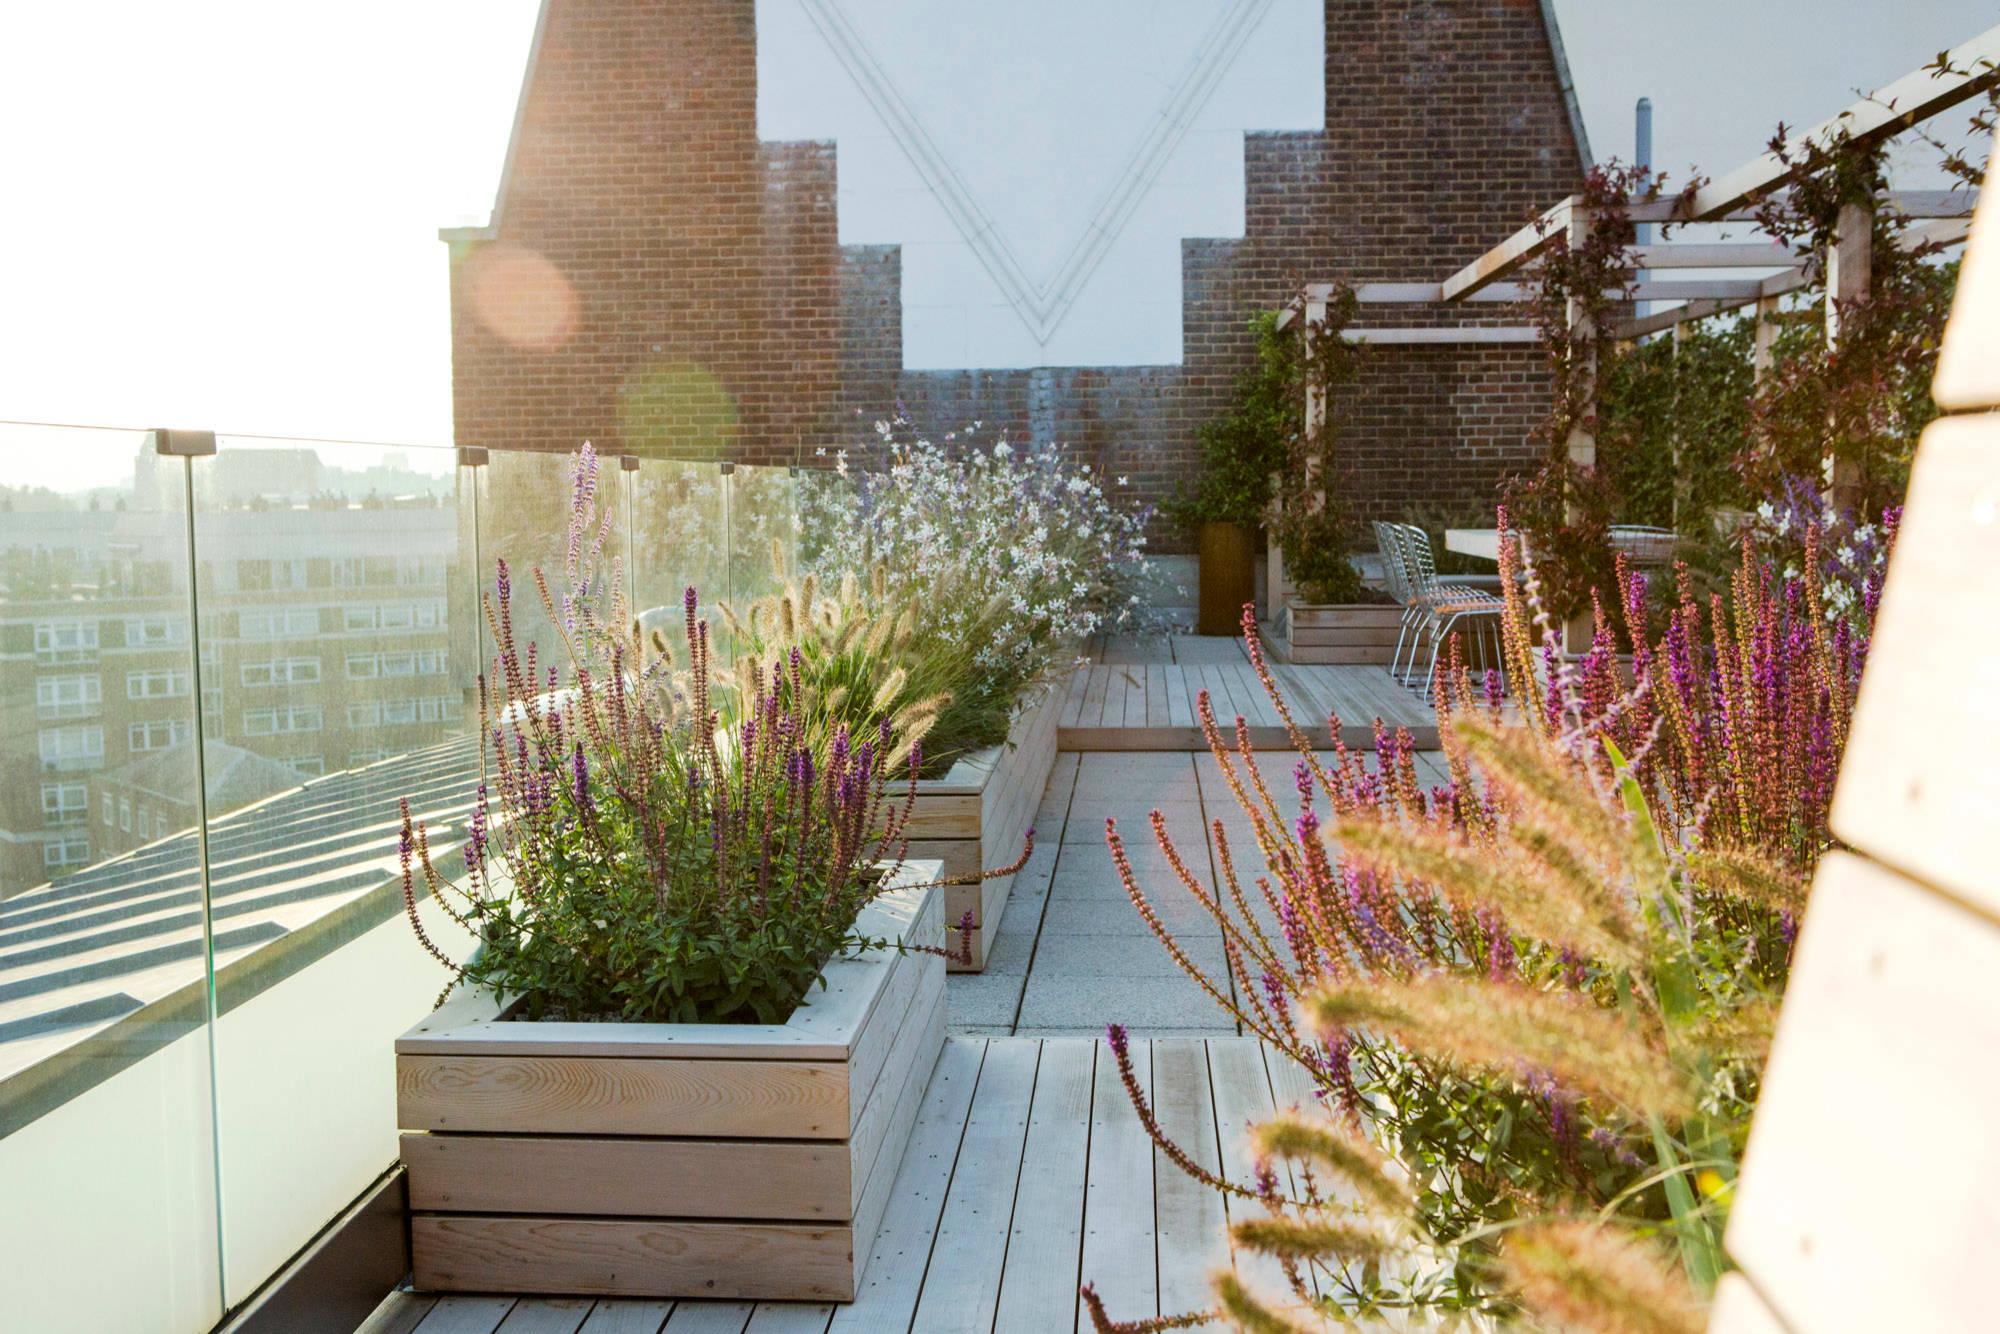 16 Delightful Modern Landscape Ideas That Will Update Your ...